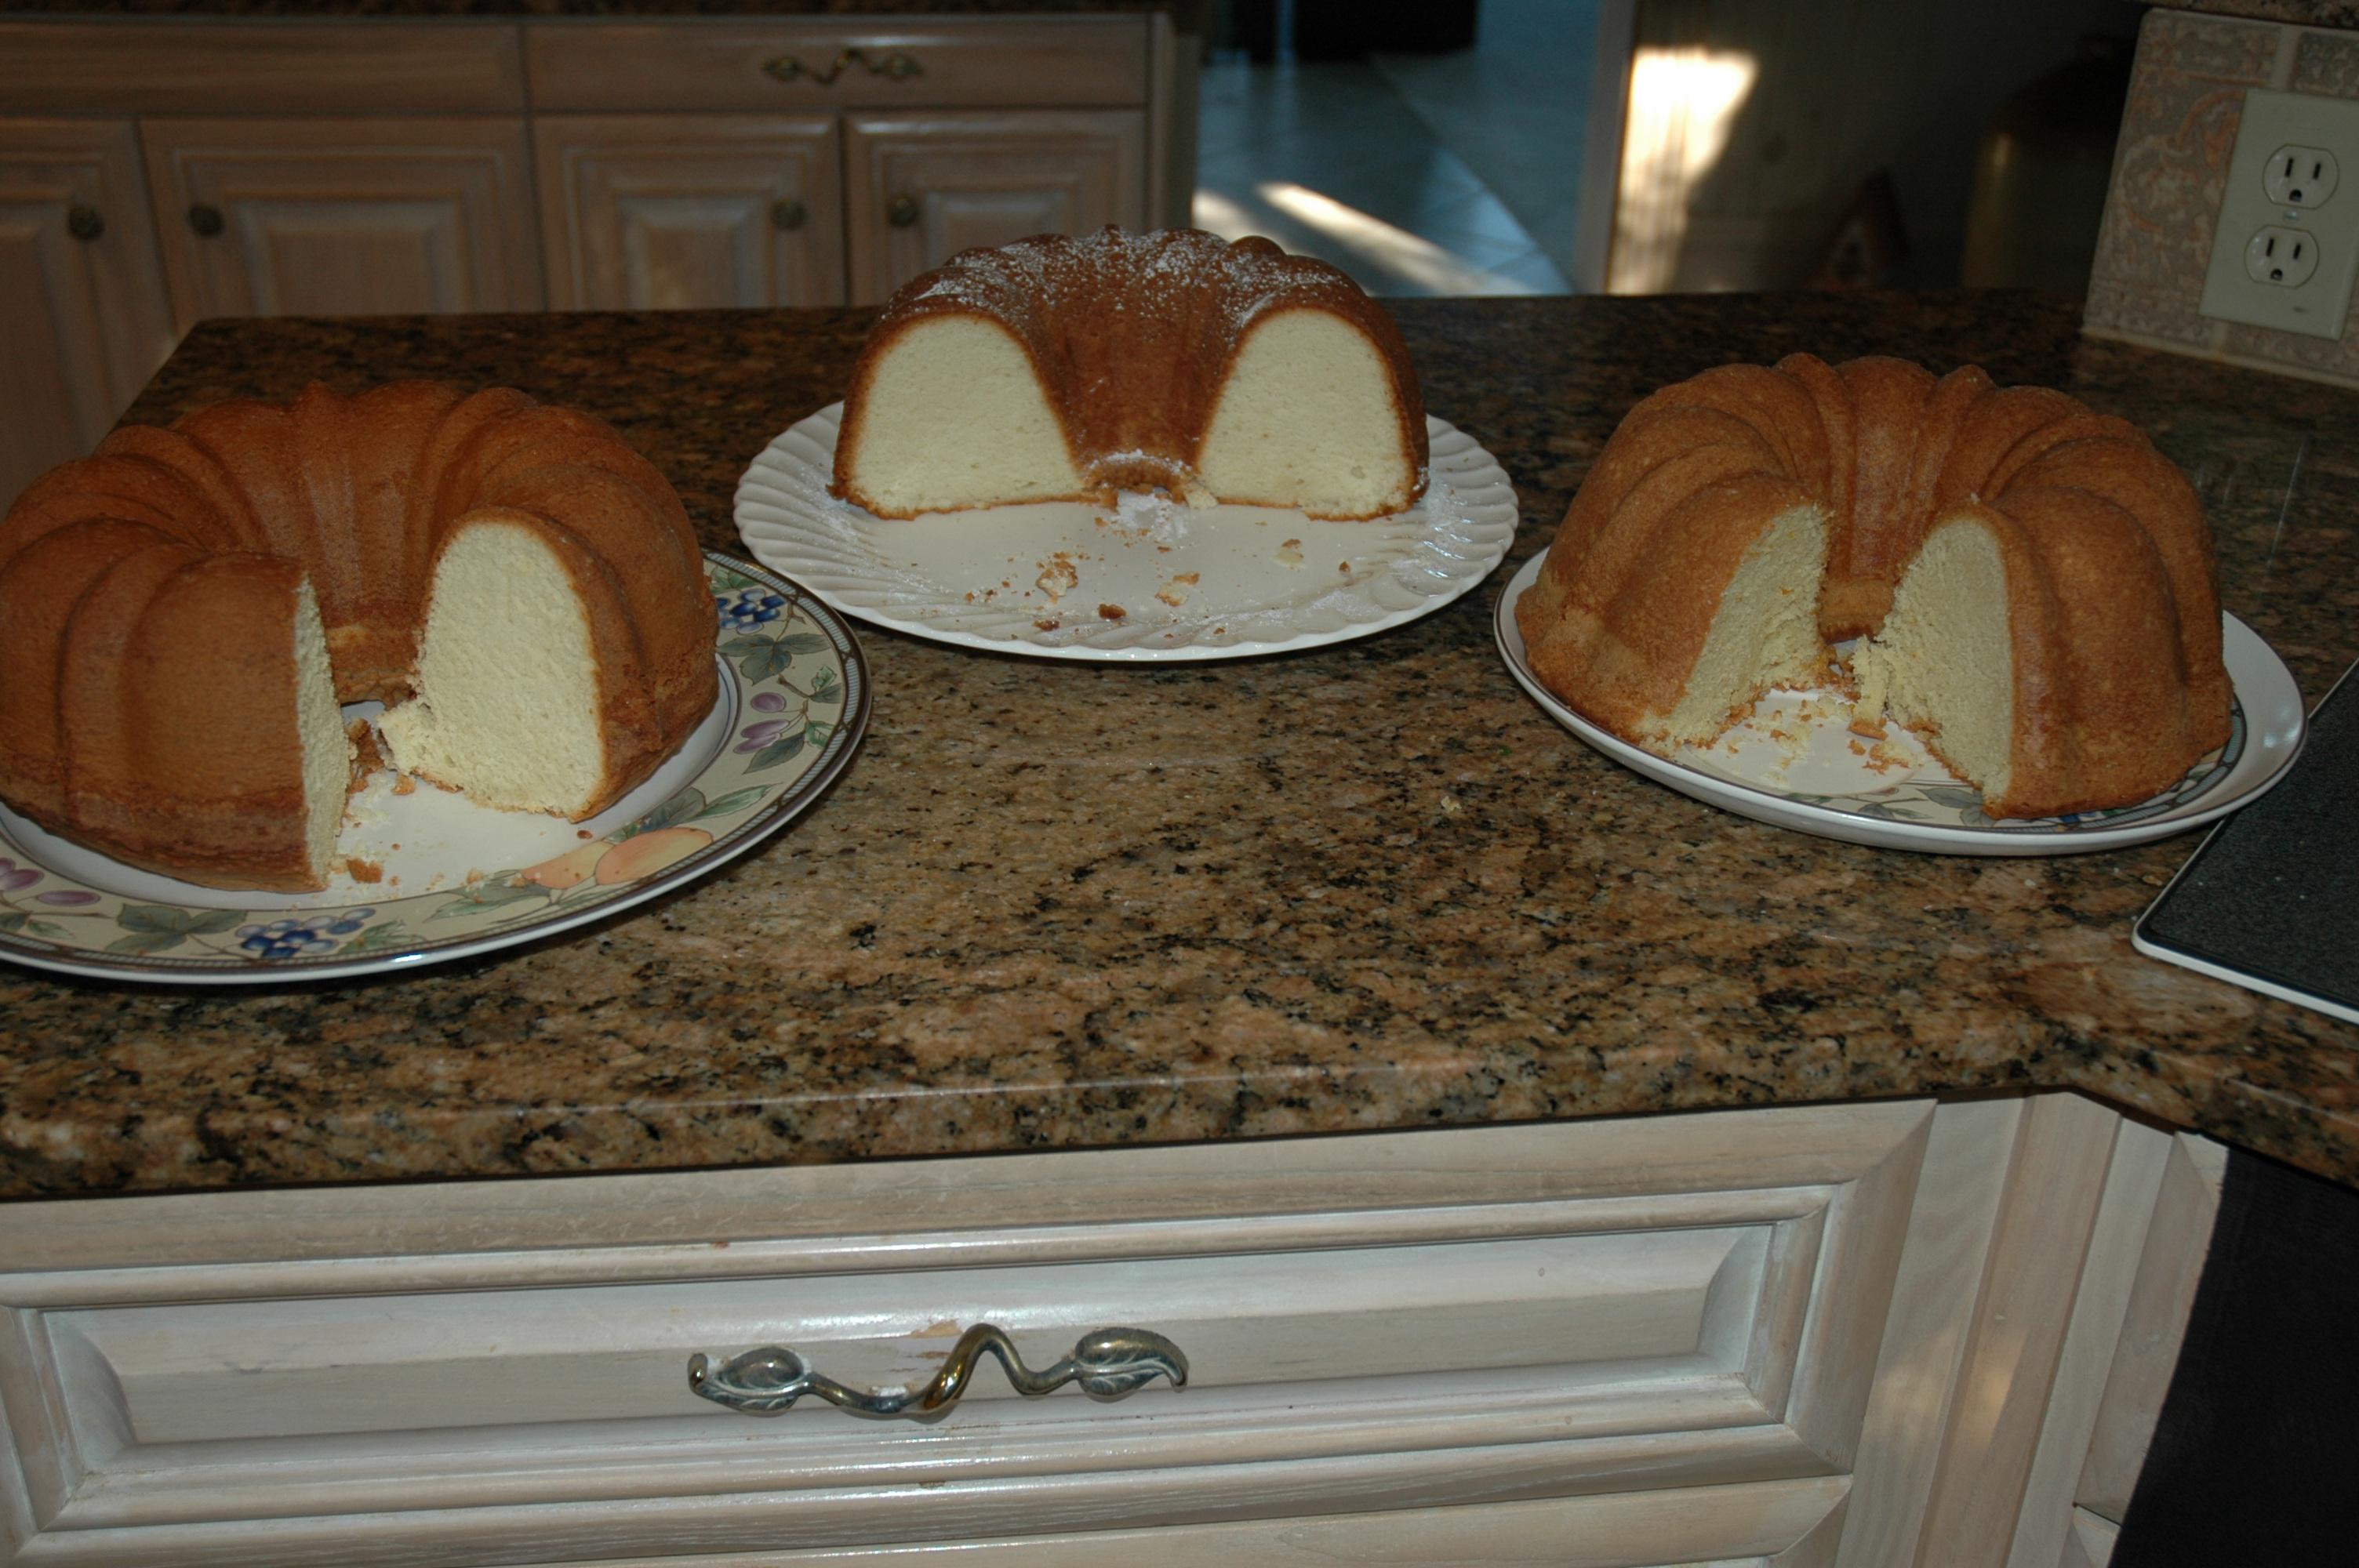 Ribbon Cake Recipe Joy Of Baking: Great Smoky Mountains Heritage Center Awards Blue Ribbons